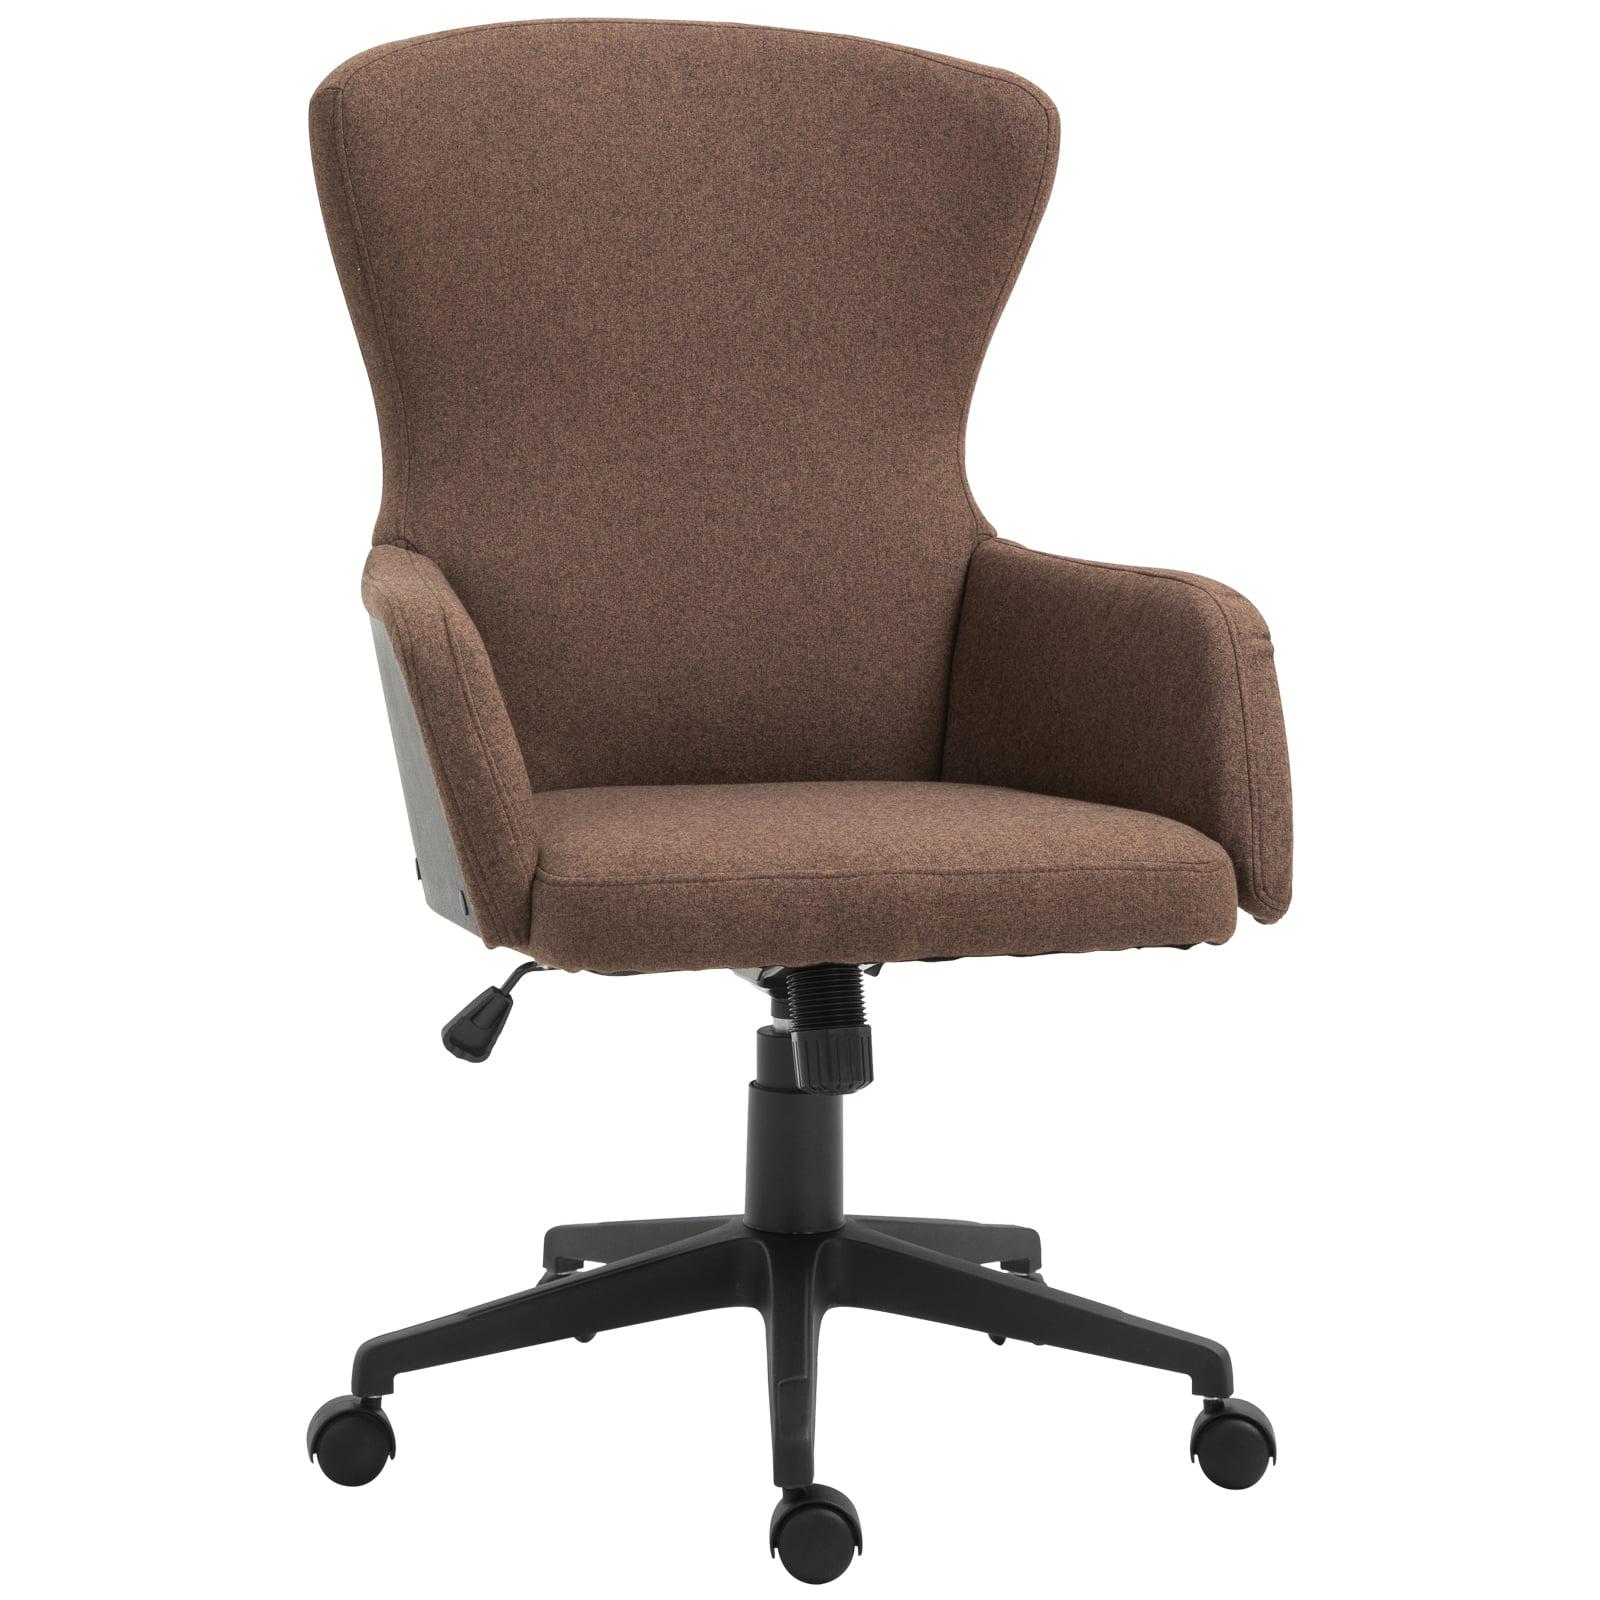 Picture of: Vinsetto Ergonomic Rolling Office Desk Computer Chair With 5 Castor Wheels Easy Adjustable Height Tilt Walmart Com Walmart Com